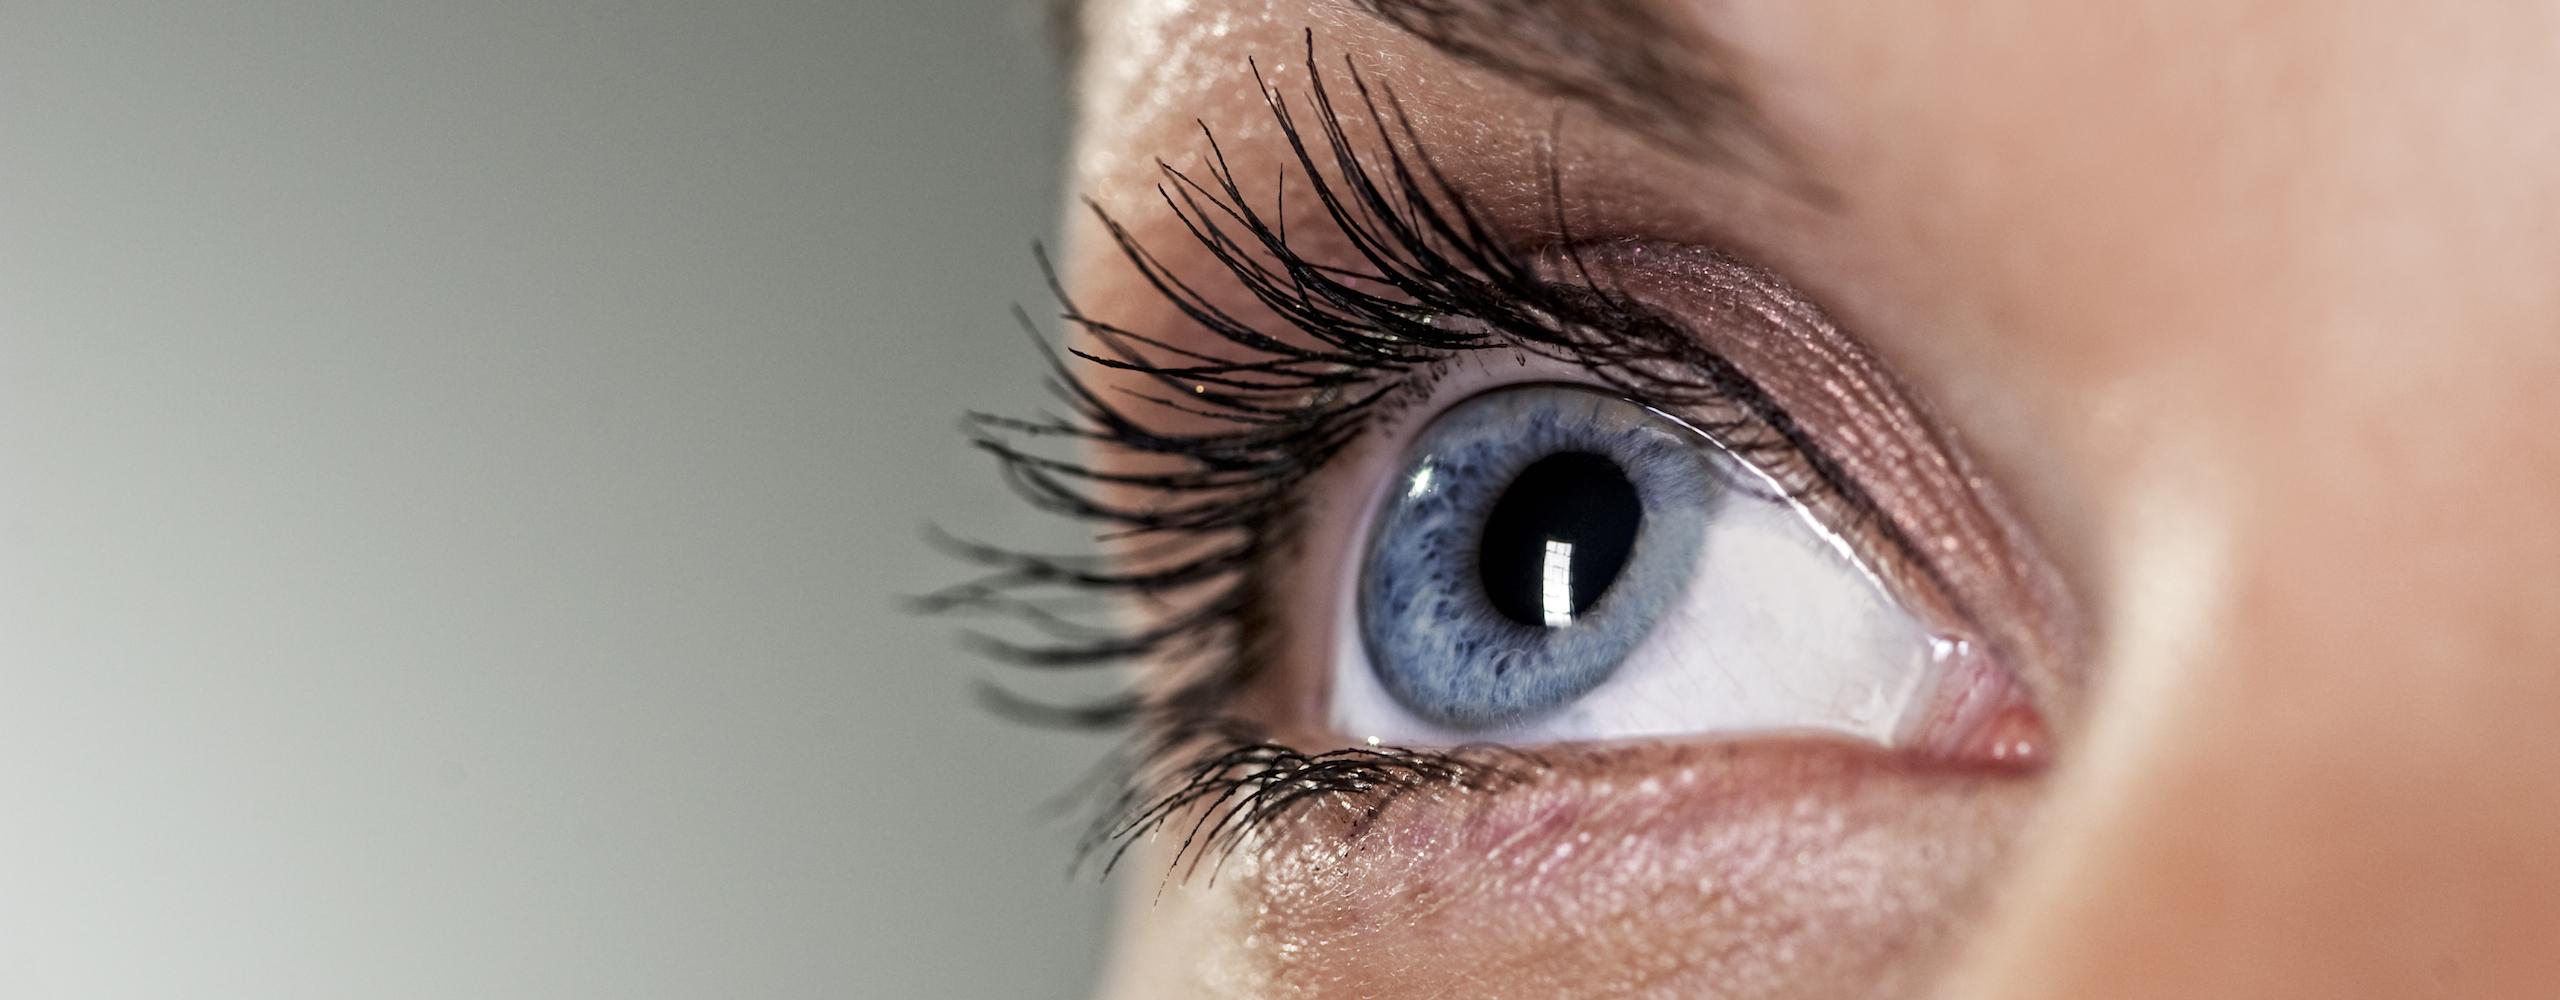 LASIK Eye Surgery In Kentucky